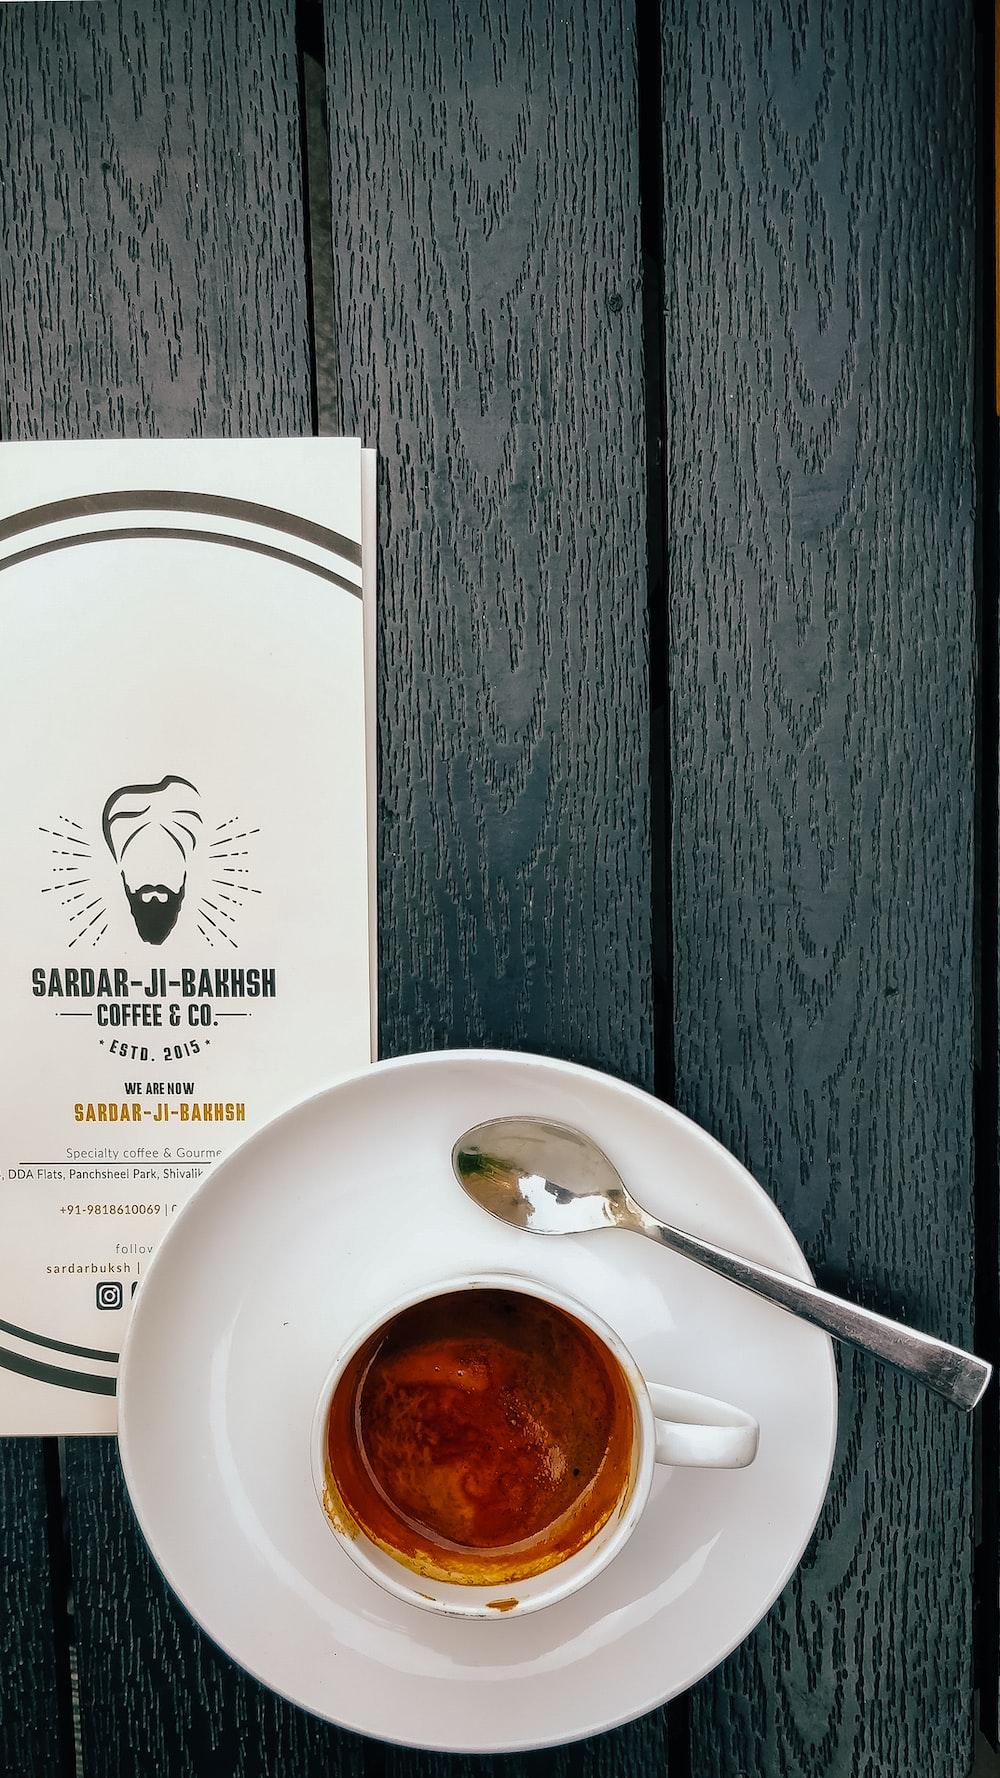 coffee in white ceramic mug near teaspoon